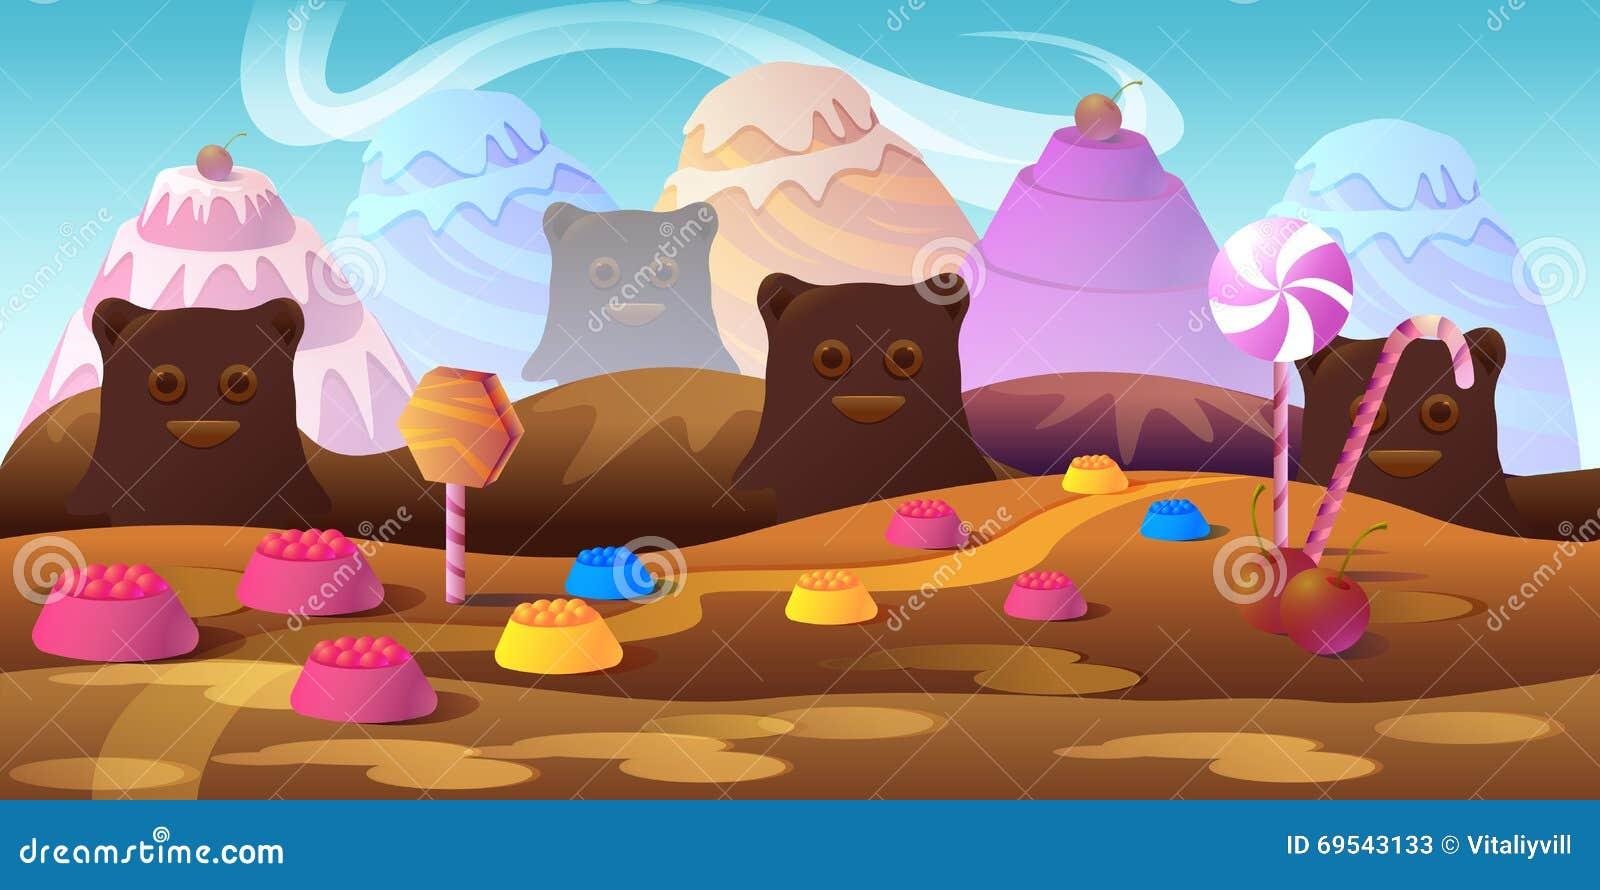 Cartoon Fairy Tale Landscape Candy Land Illustration For